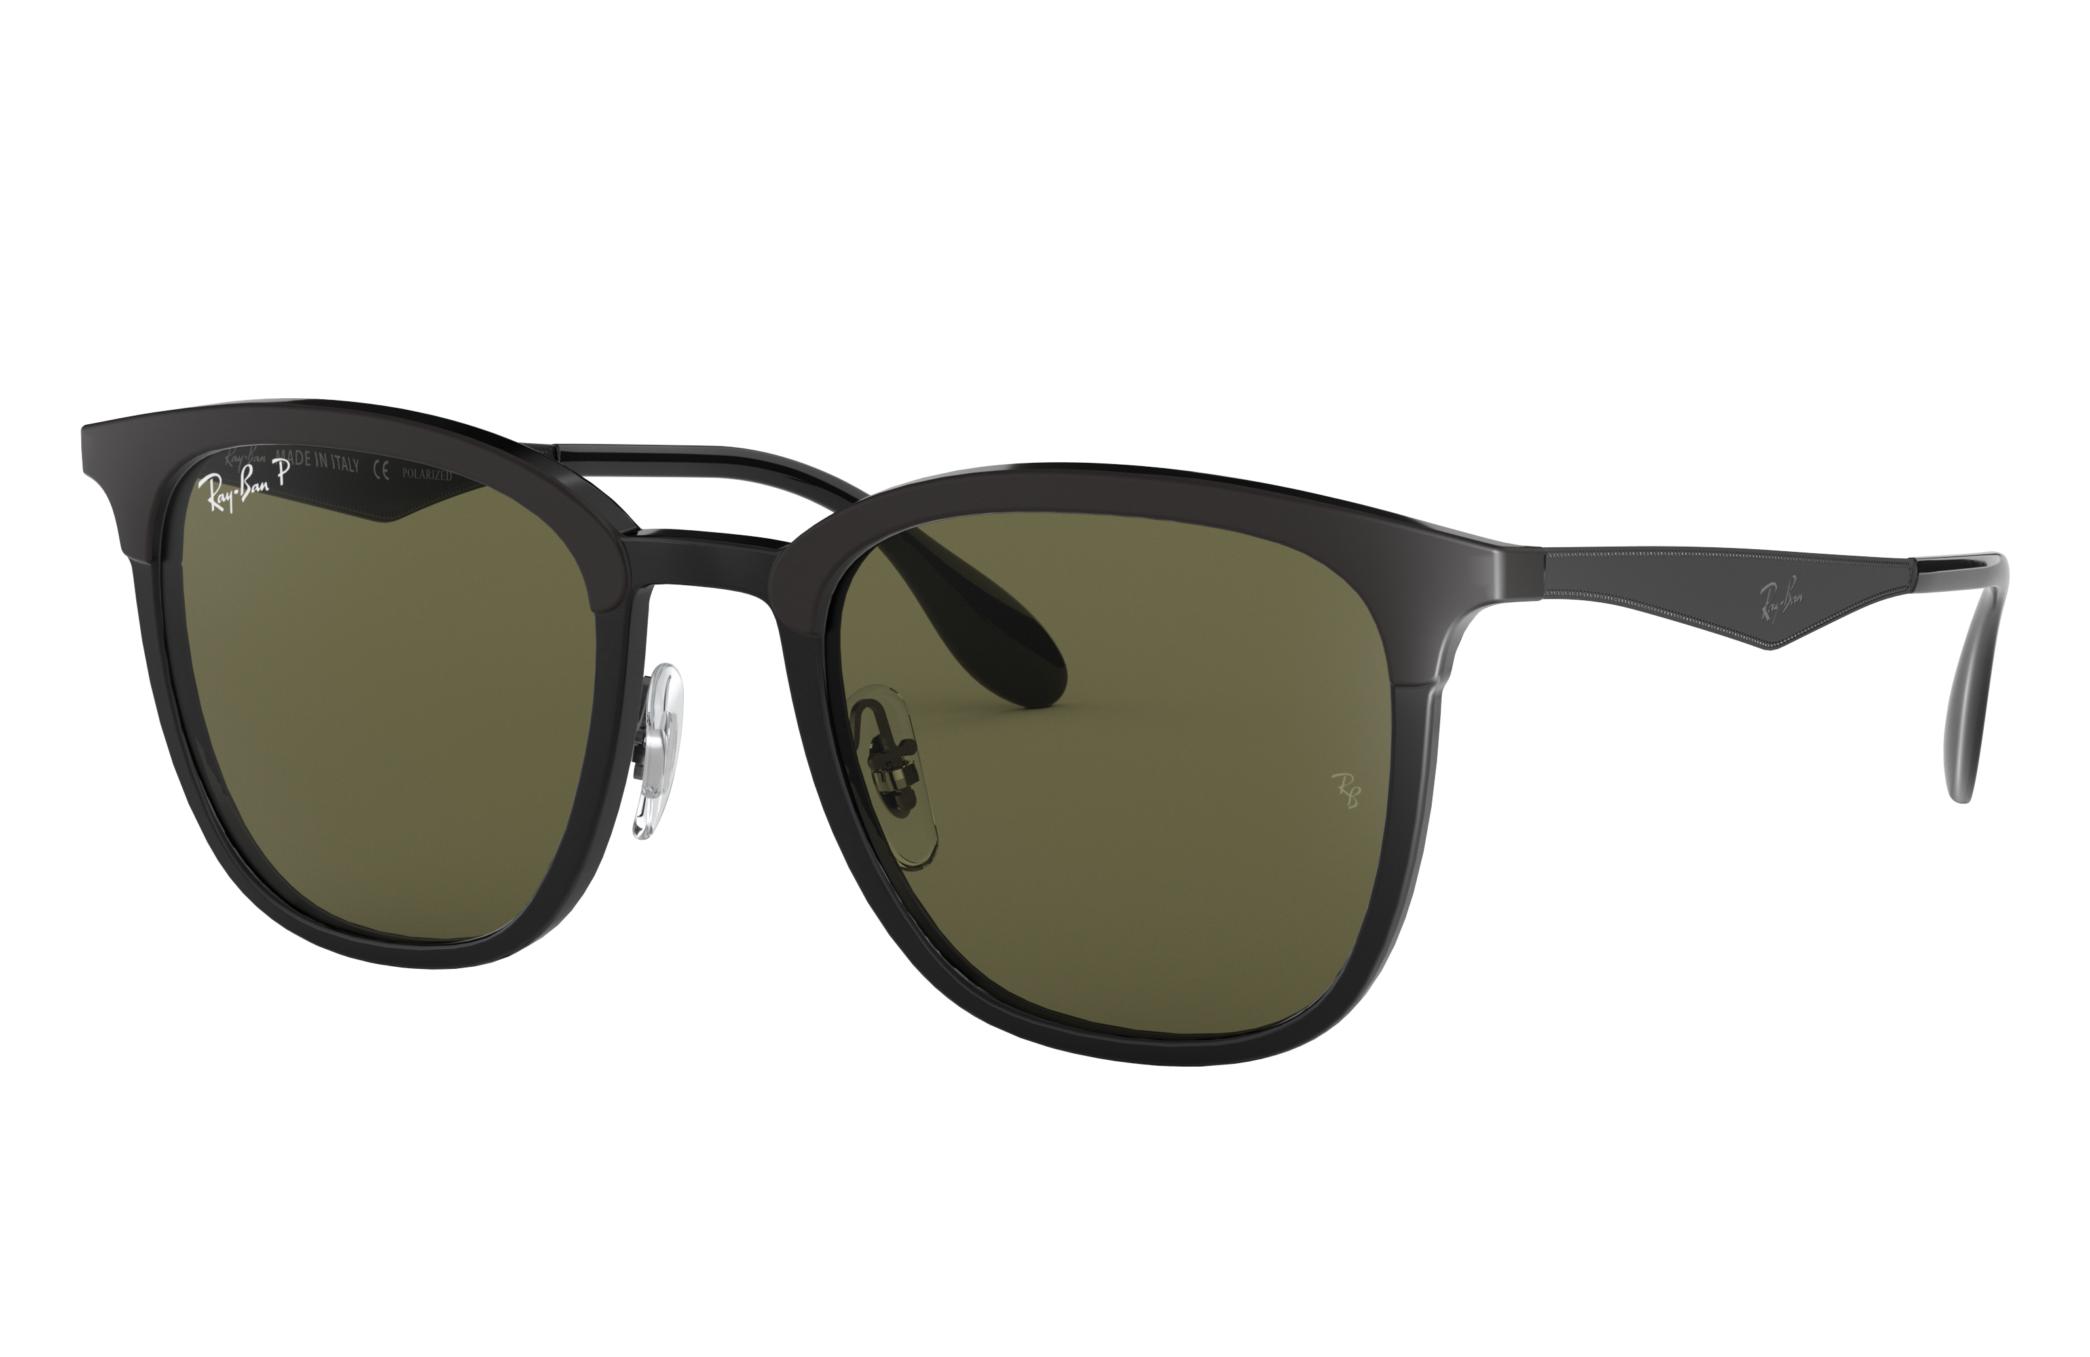 Ray-Ban Rb4278 Black, Polarized Green Lenses - RB4278